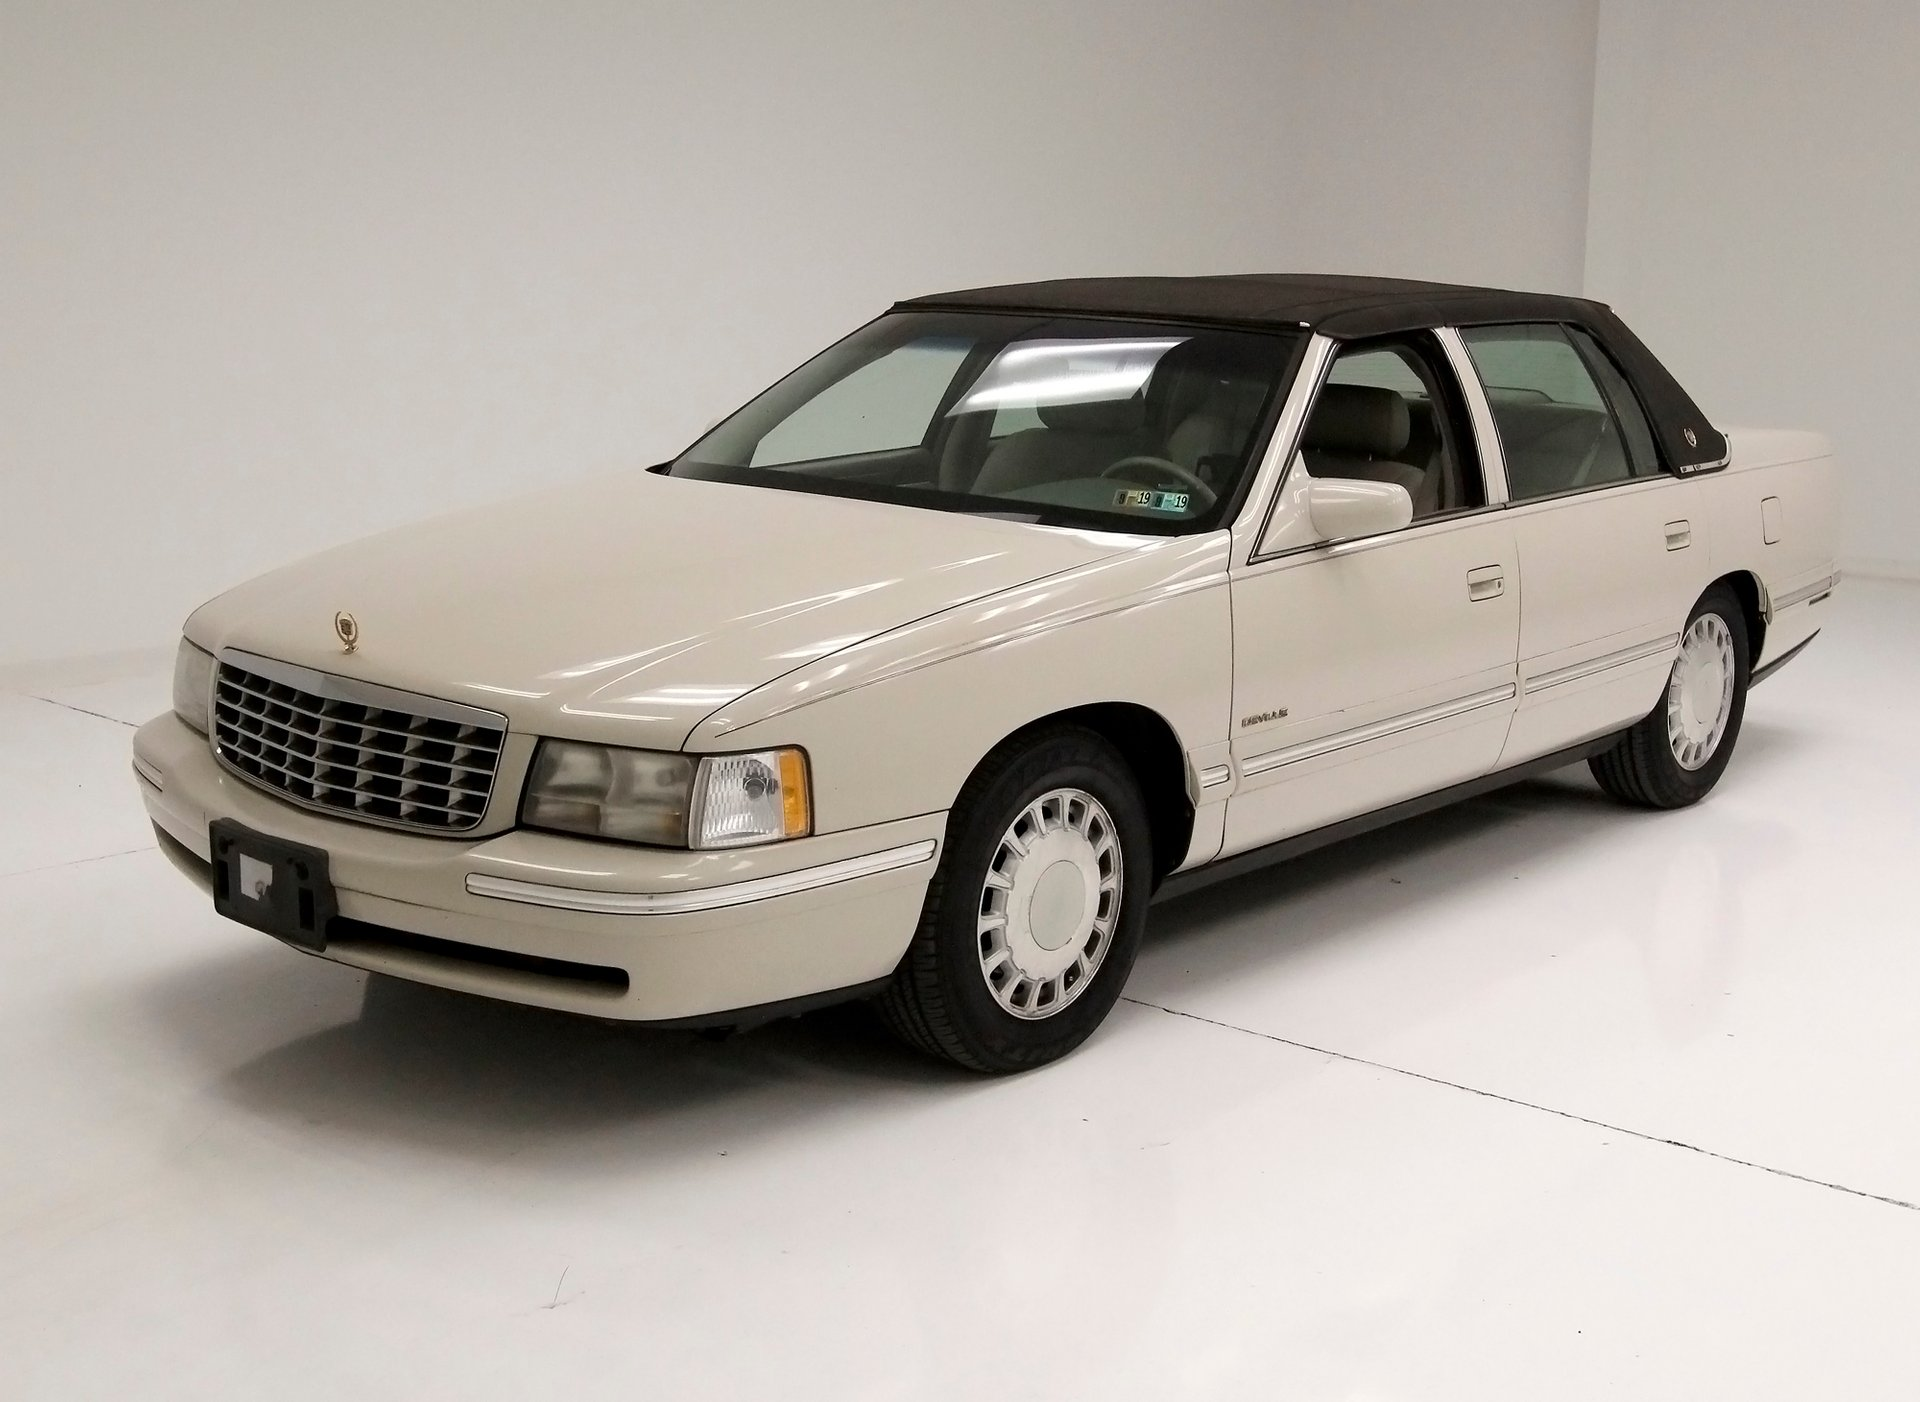 1997 Cadillac Sedan DeVille